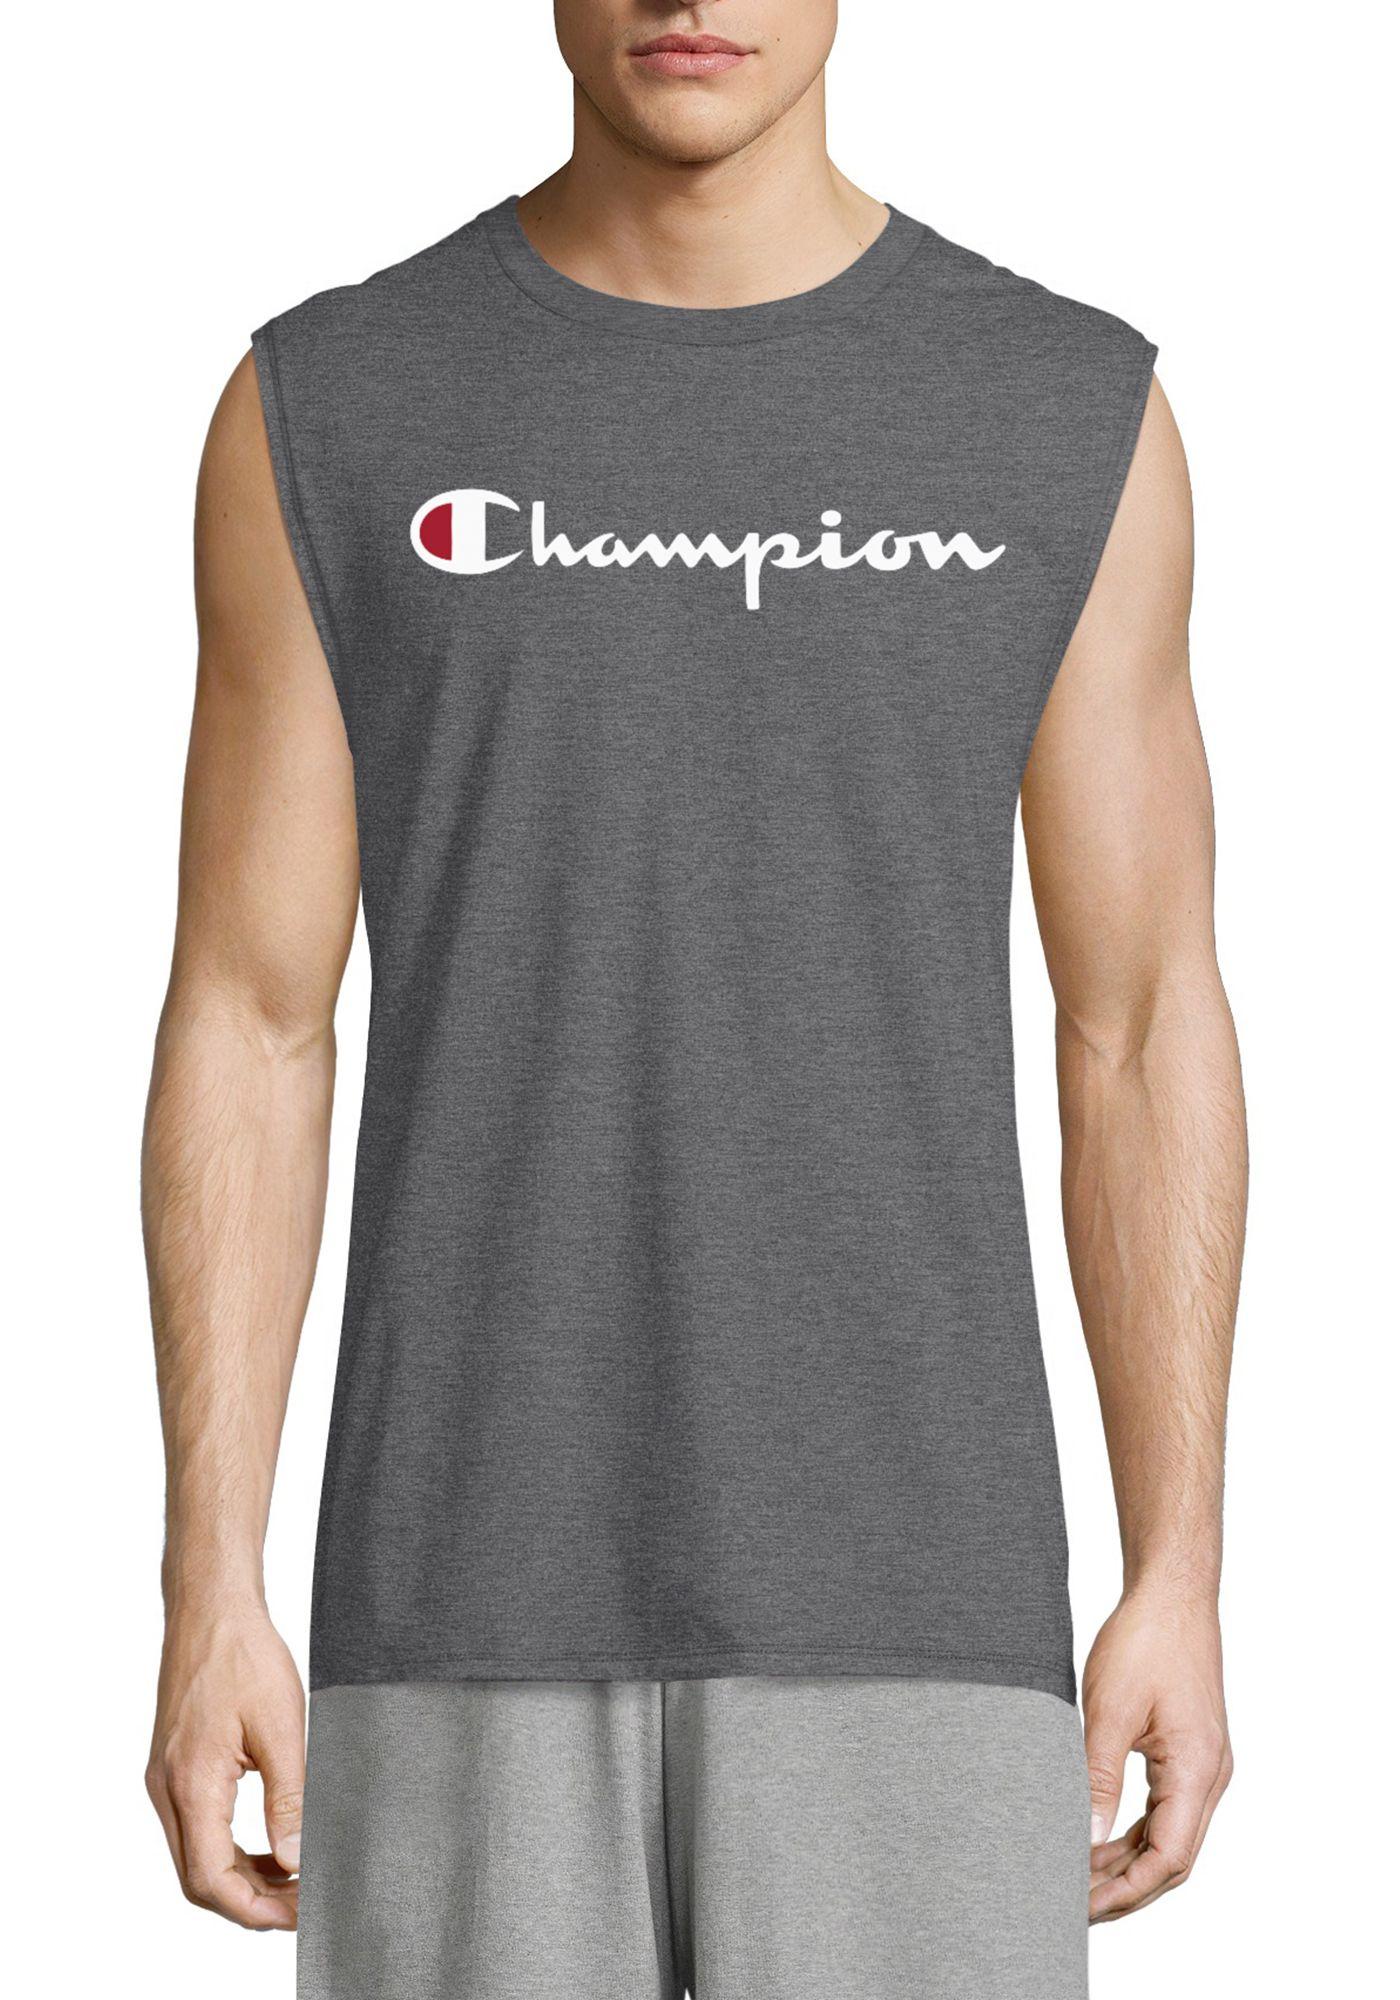 Champion Men's Classic Jersey Script Logo Graphic Muscle Tank Top